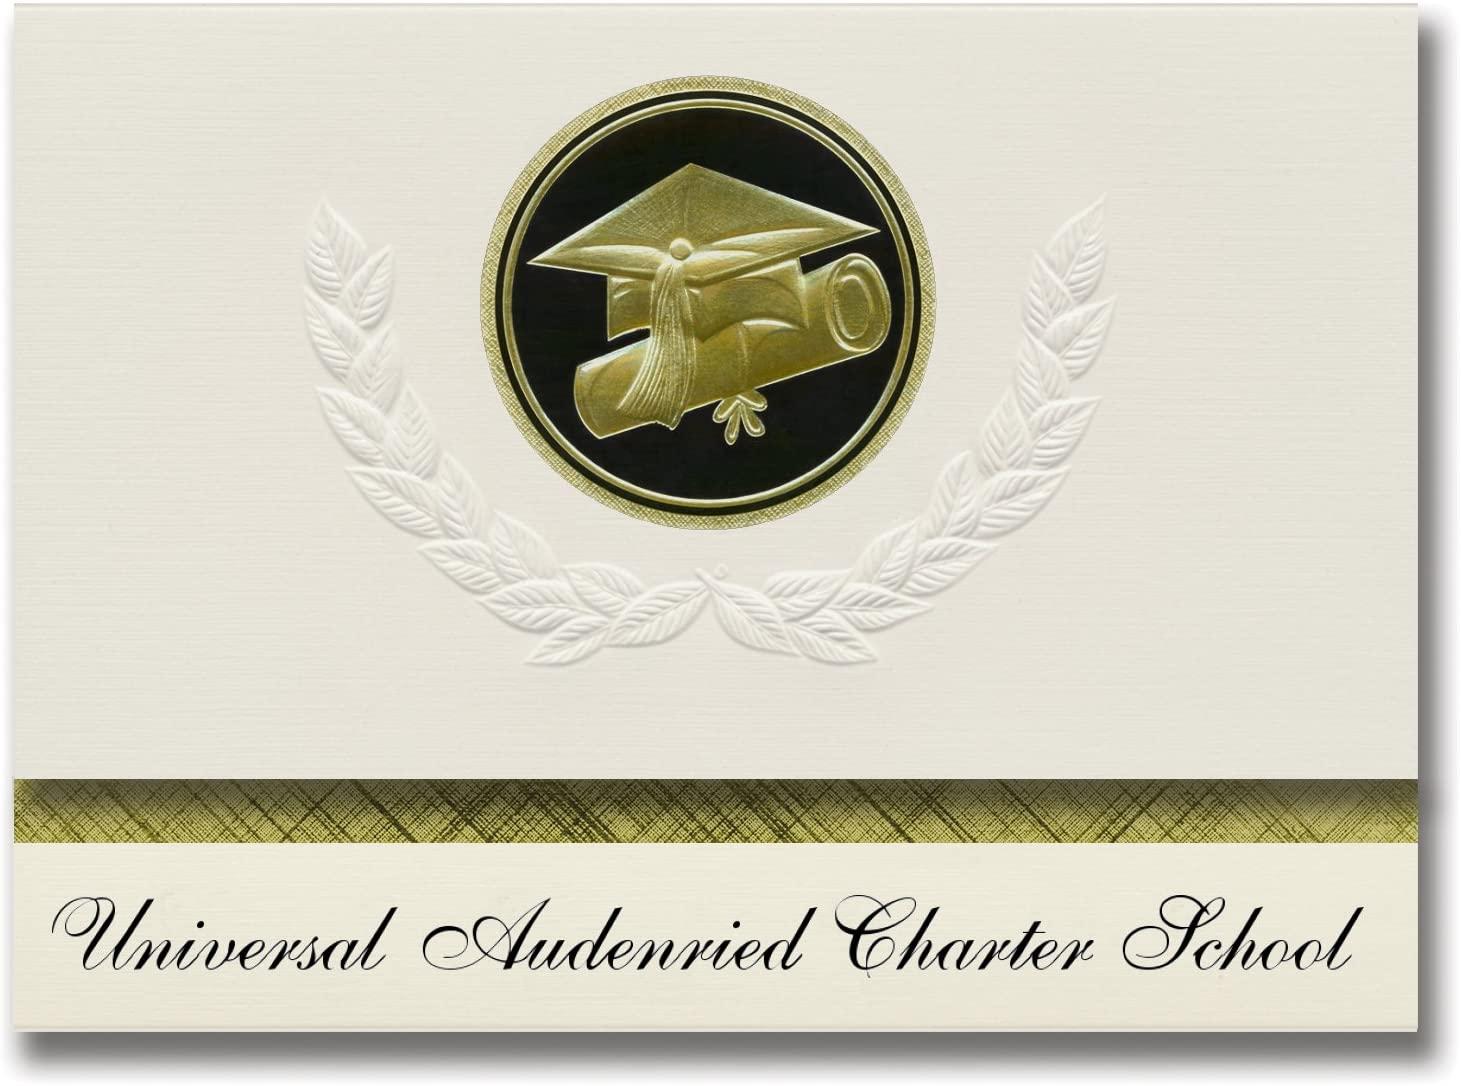 Signature Announcements Universal Audenried Charter School (Philadelphia, PA) Graduation Announcements, Presidential Elite Pack 25 Cap & Diploma Seal Black & Gold